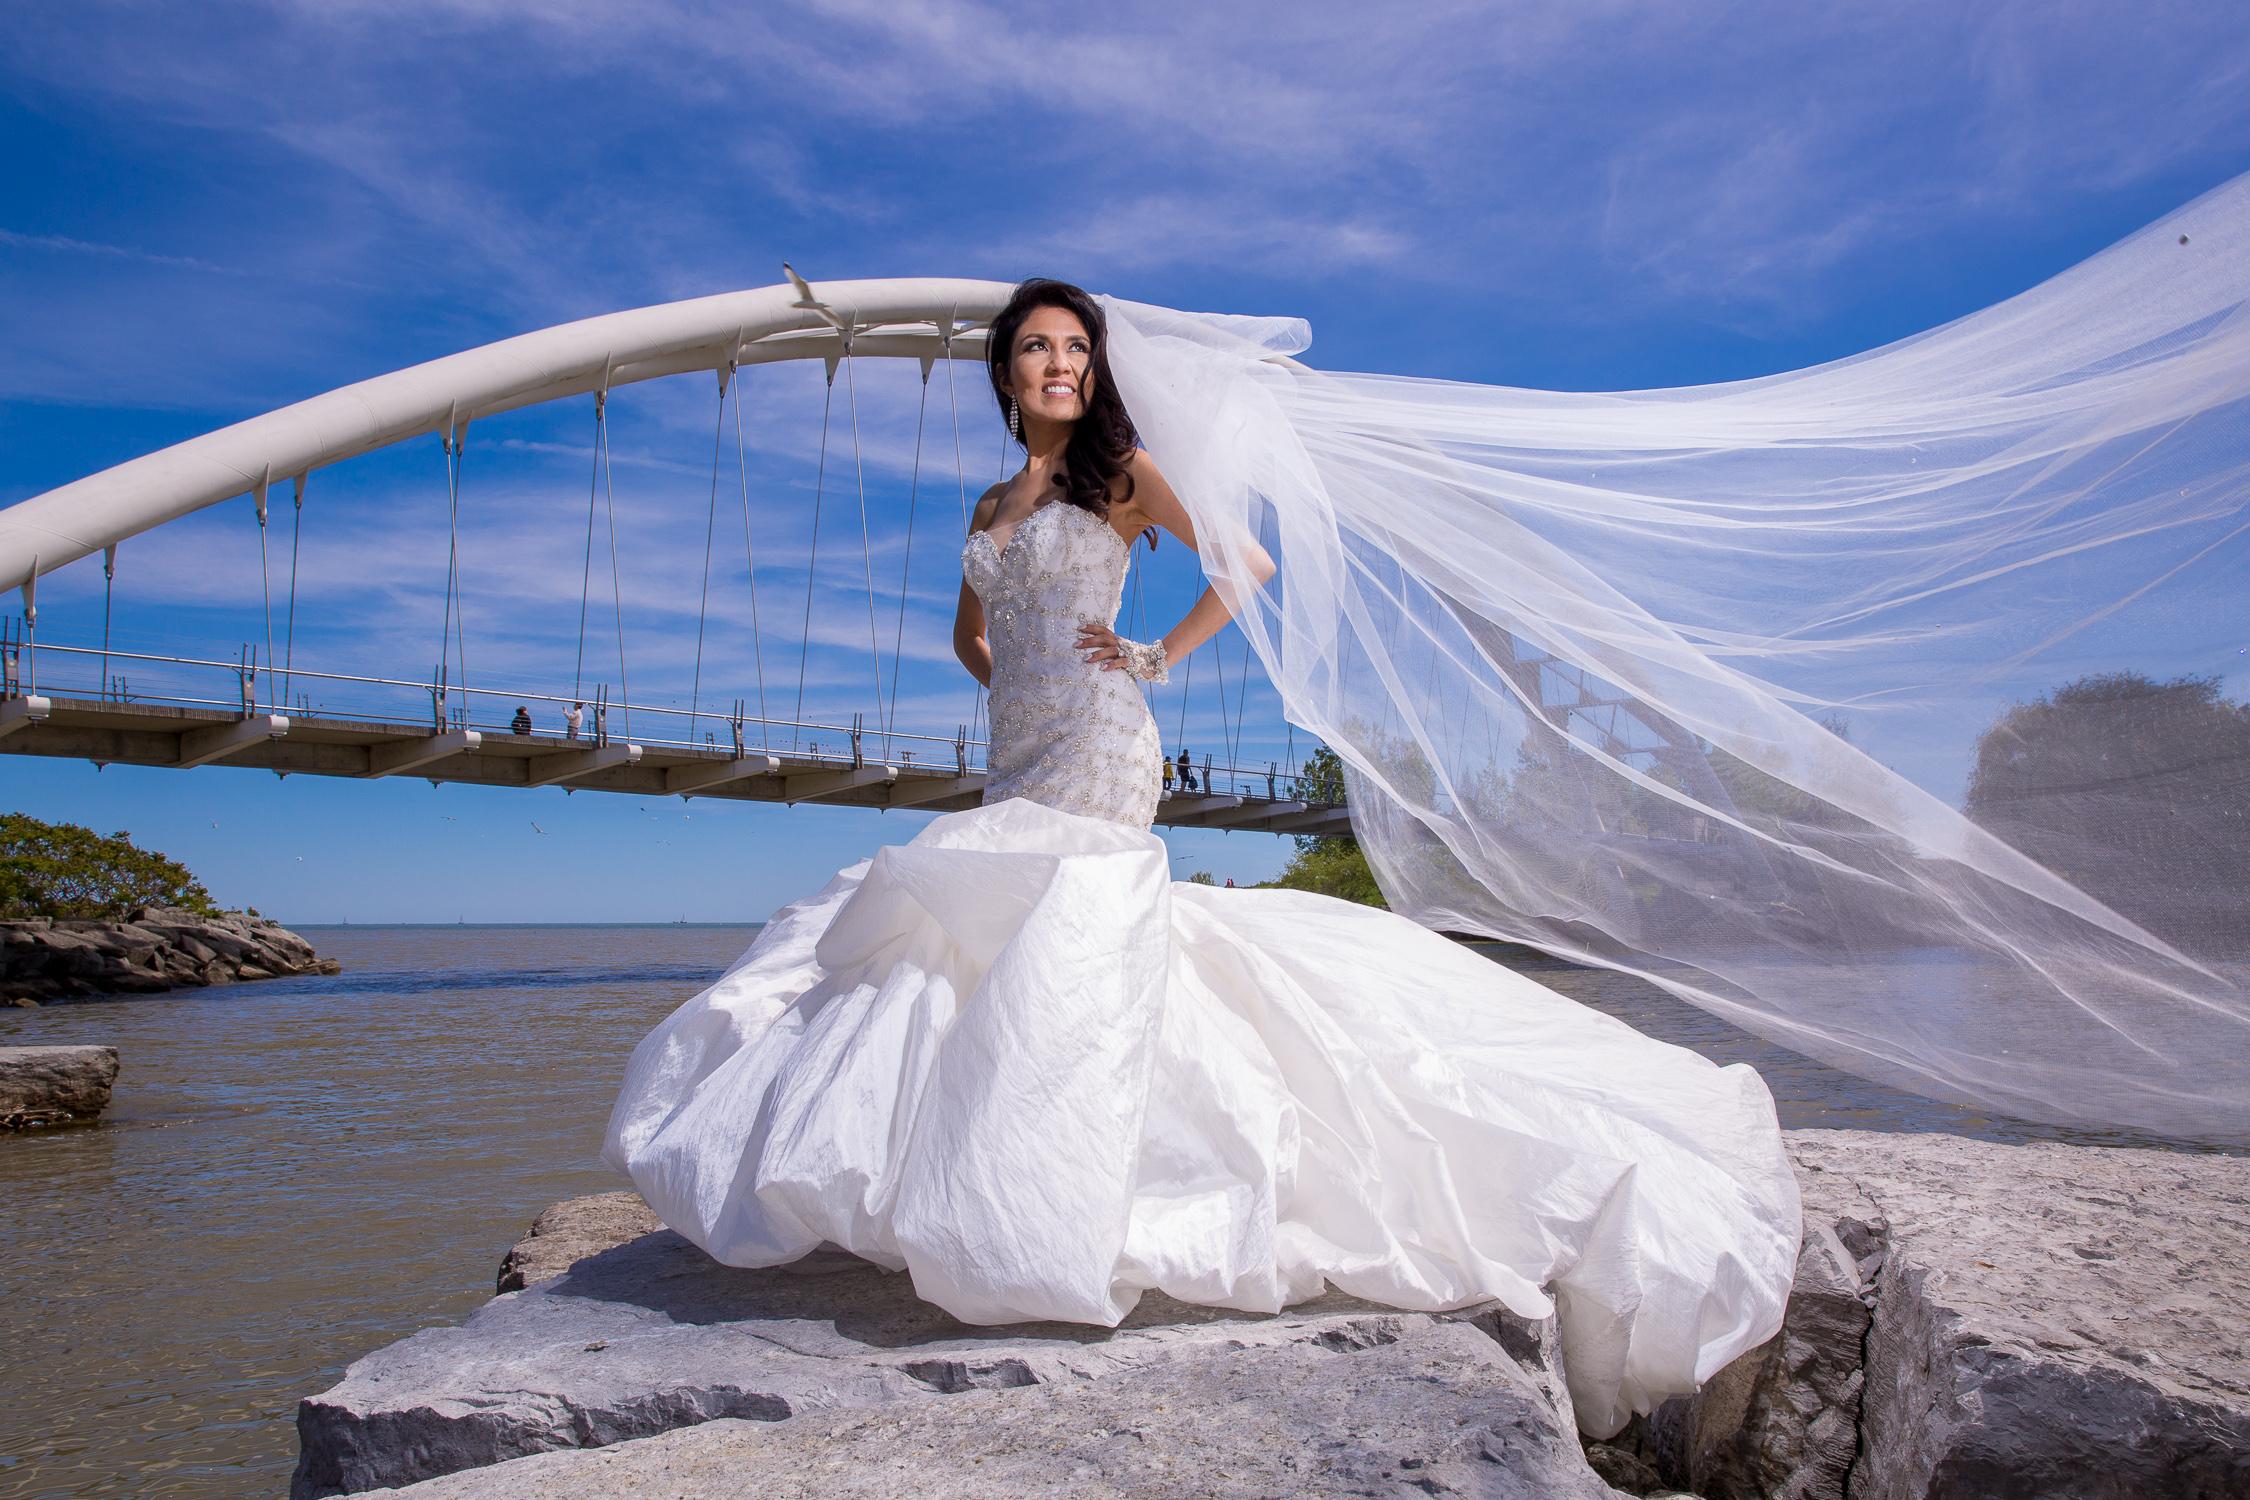 Paradise-Banquet-Hall-Wedding-Vaughan-Ontario-0067.jpg